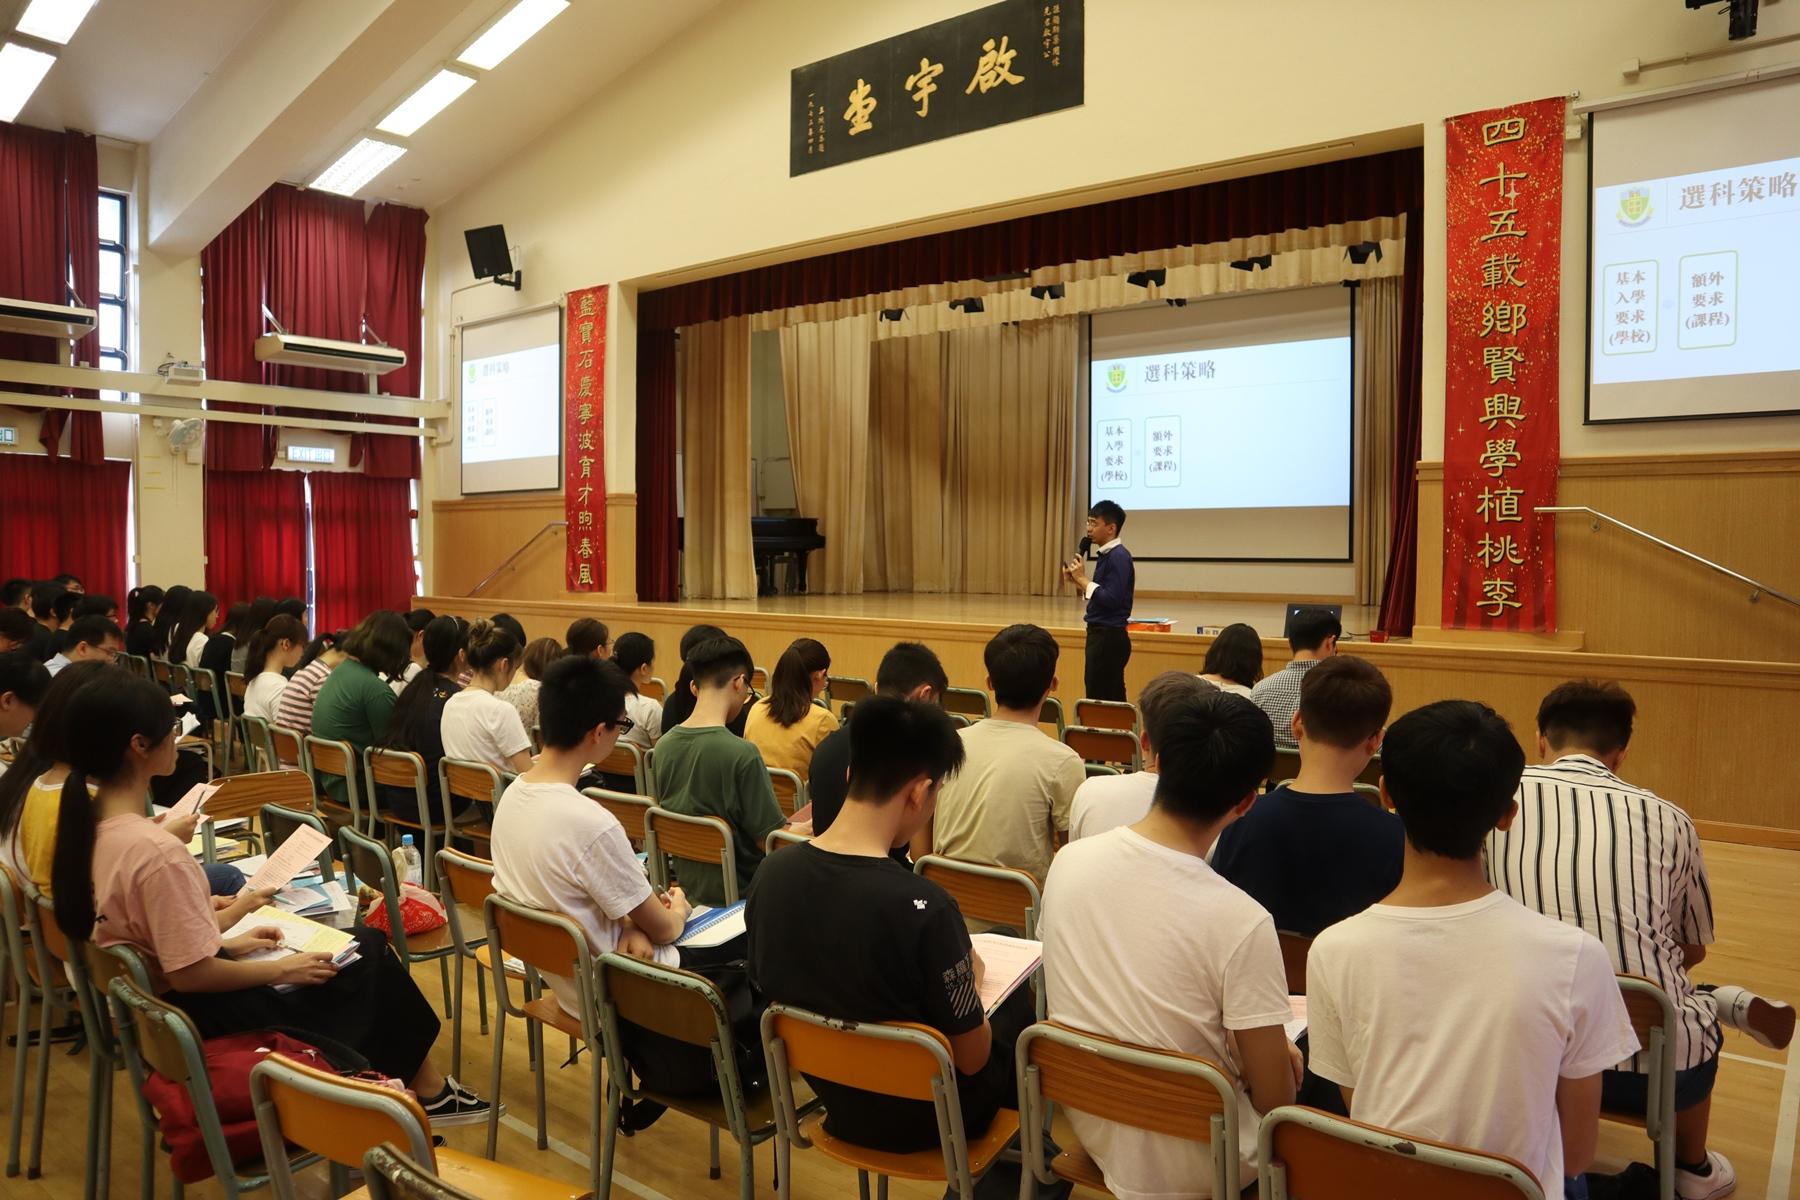 https://npc.edu.hk/sites/default/files/img_9187.jpg